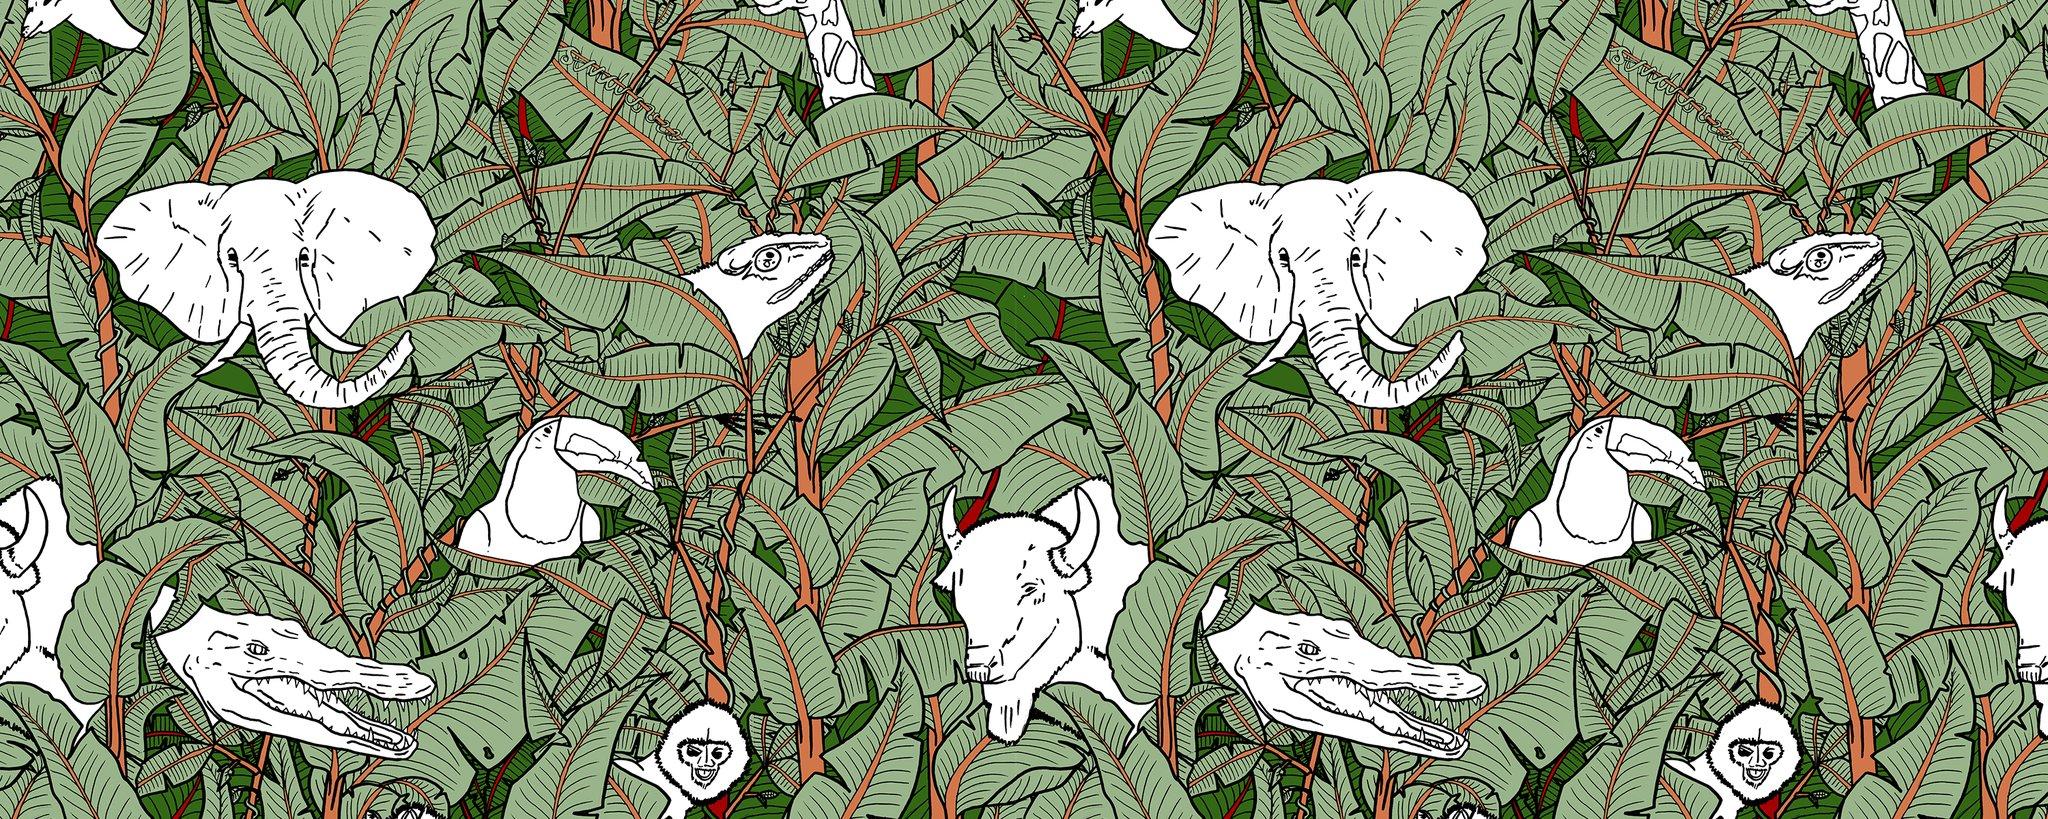 Jungle_loop_02_copy_2048x2048.jpg